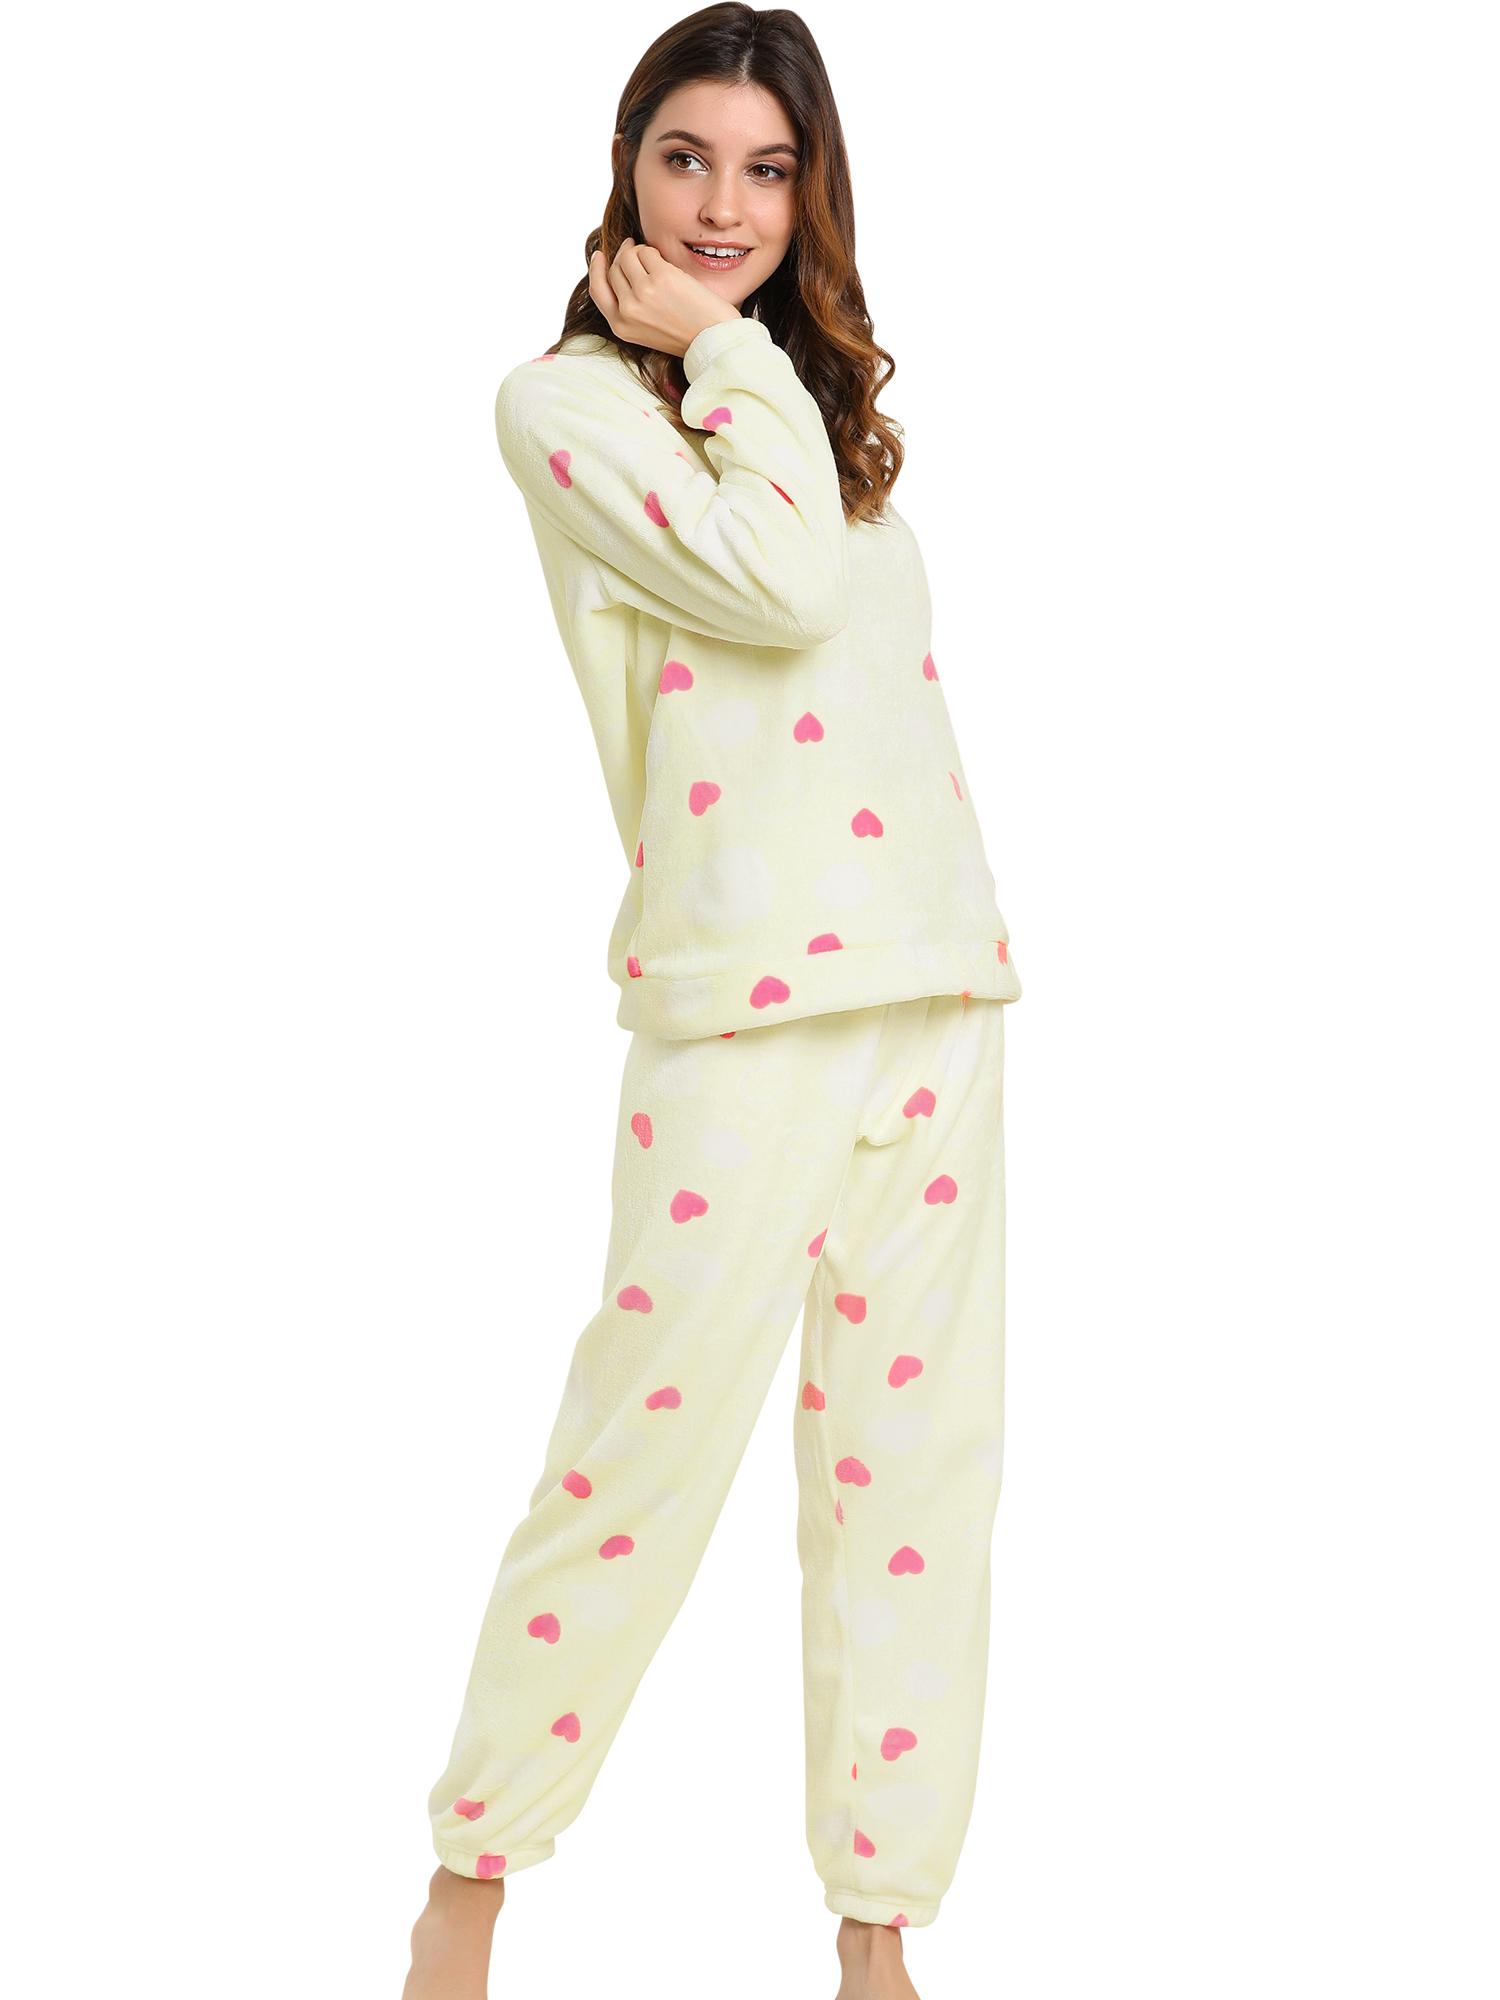 Winter Flannel Pajama Sets for Women Long Sleeve Nightwear X-Large Heart Yellow